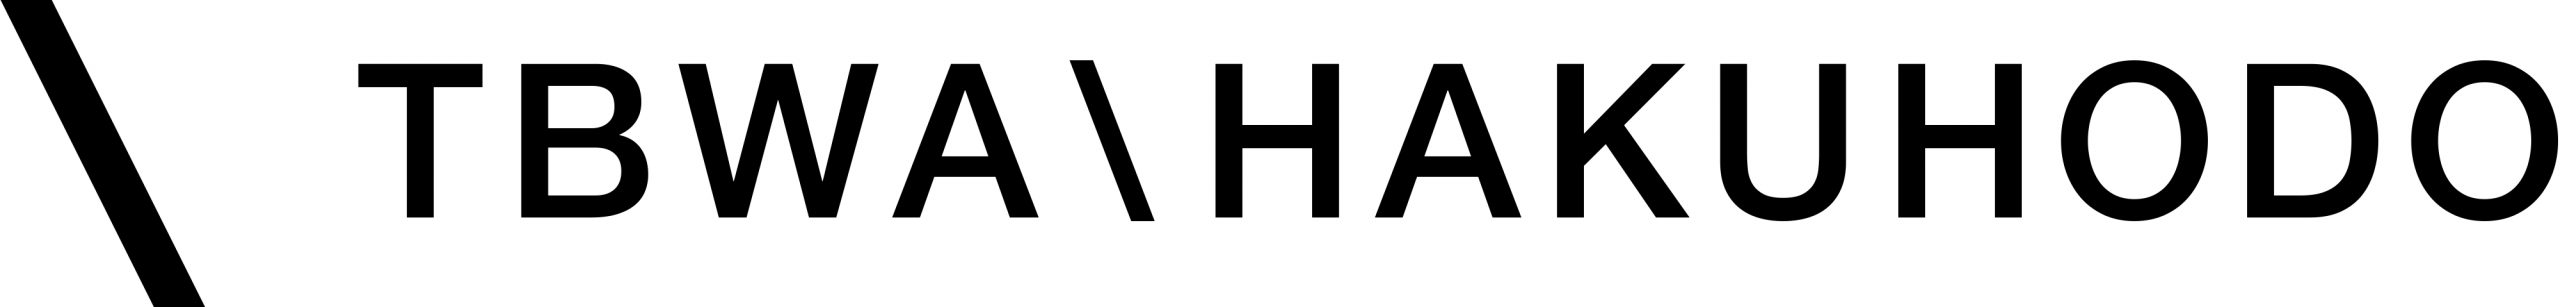 TBWA HAKUHODO、健康管理システム「Carely」を導入し、業務効率化と健康フォロー体制の構築を実施